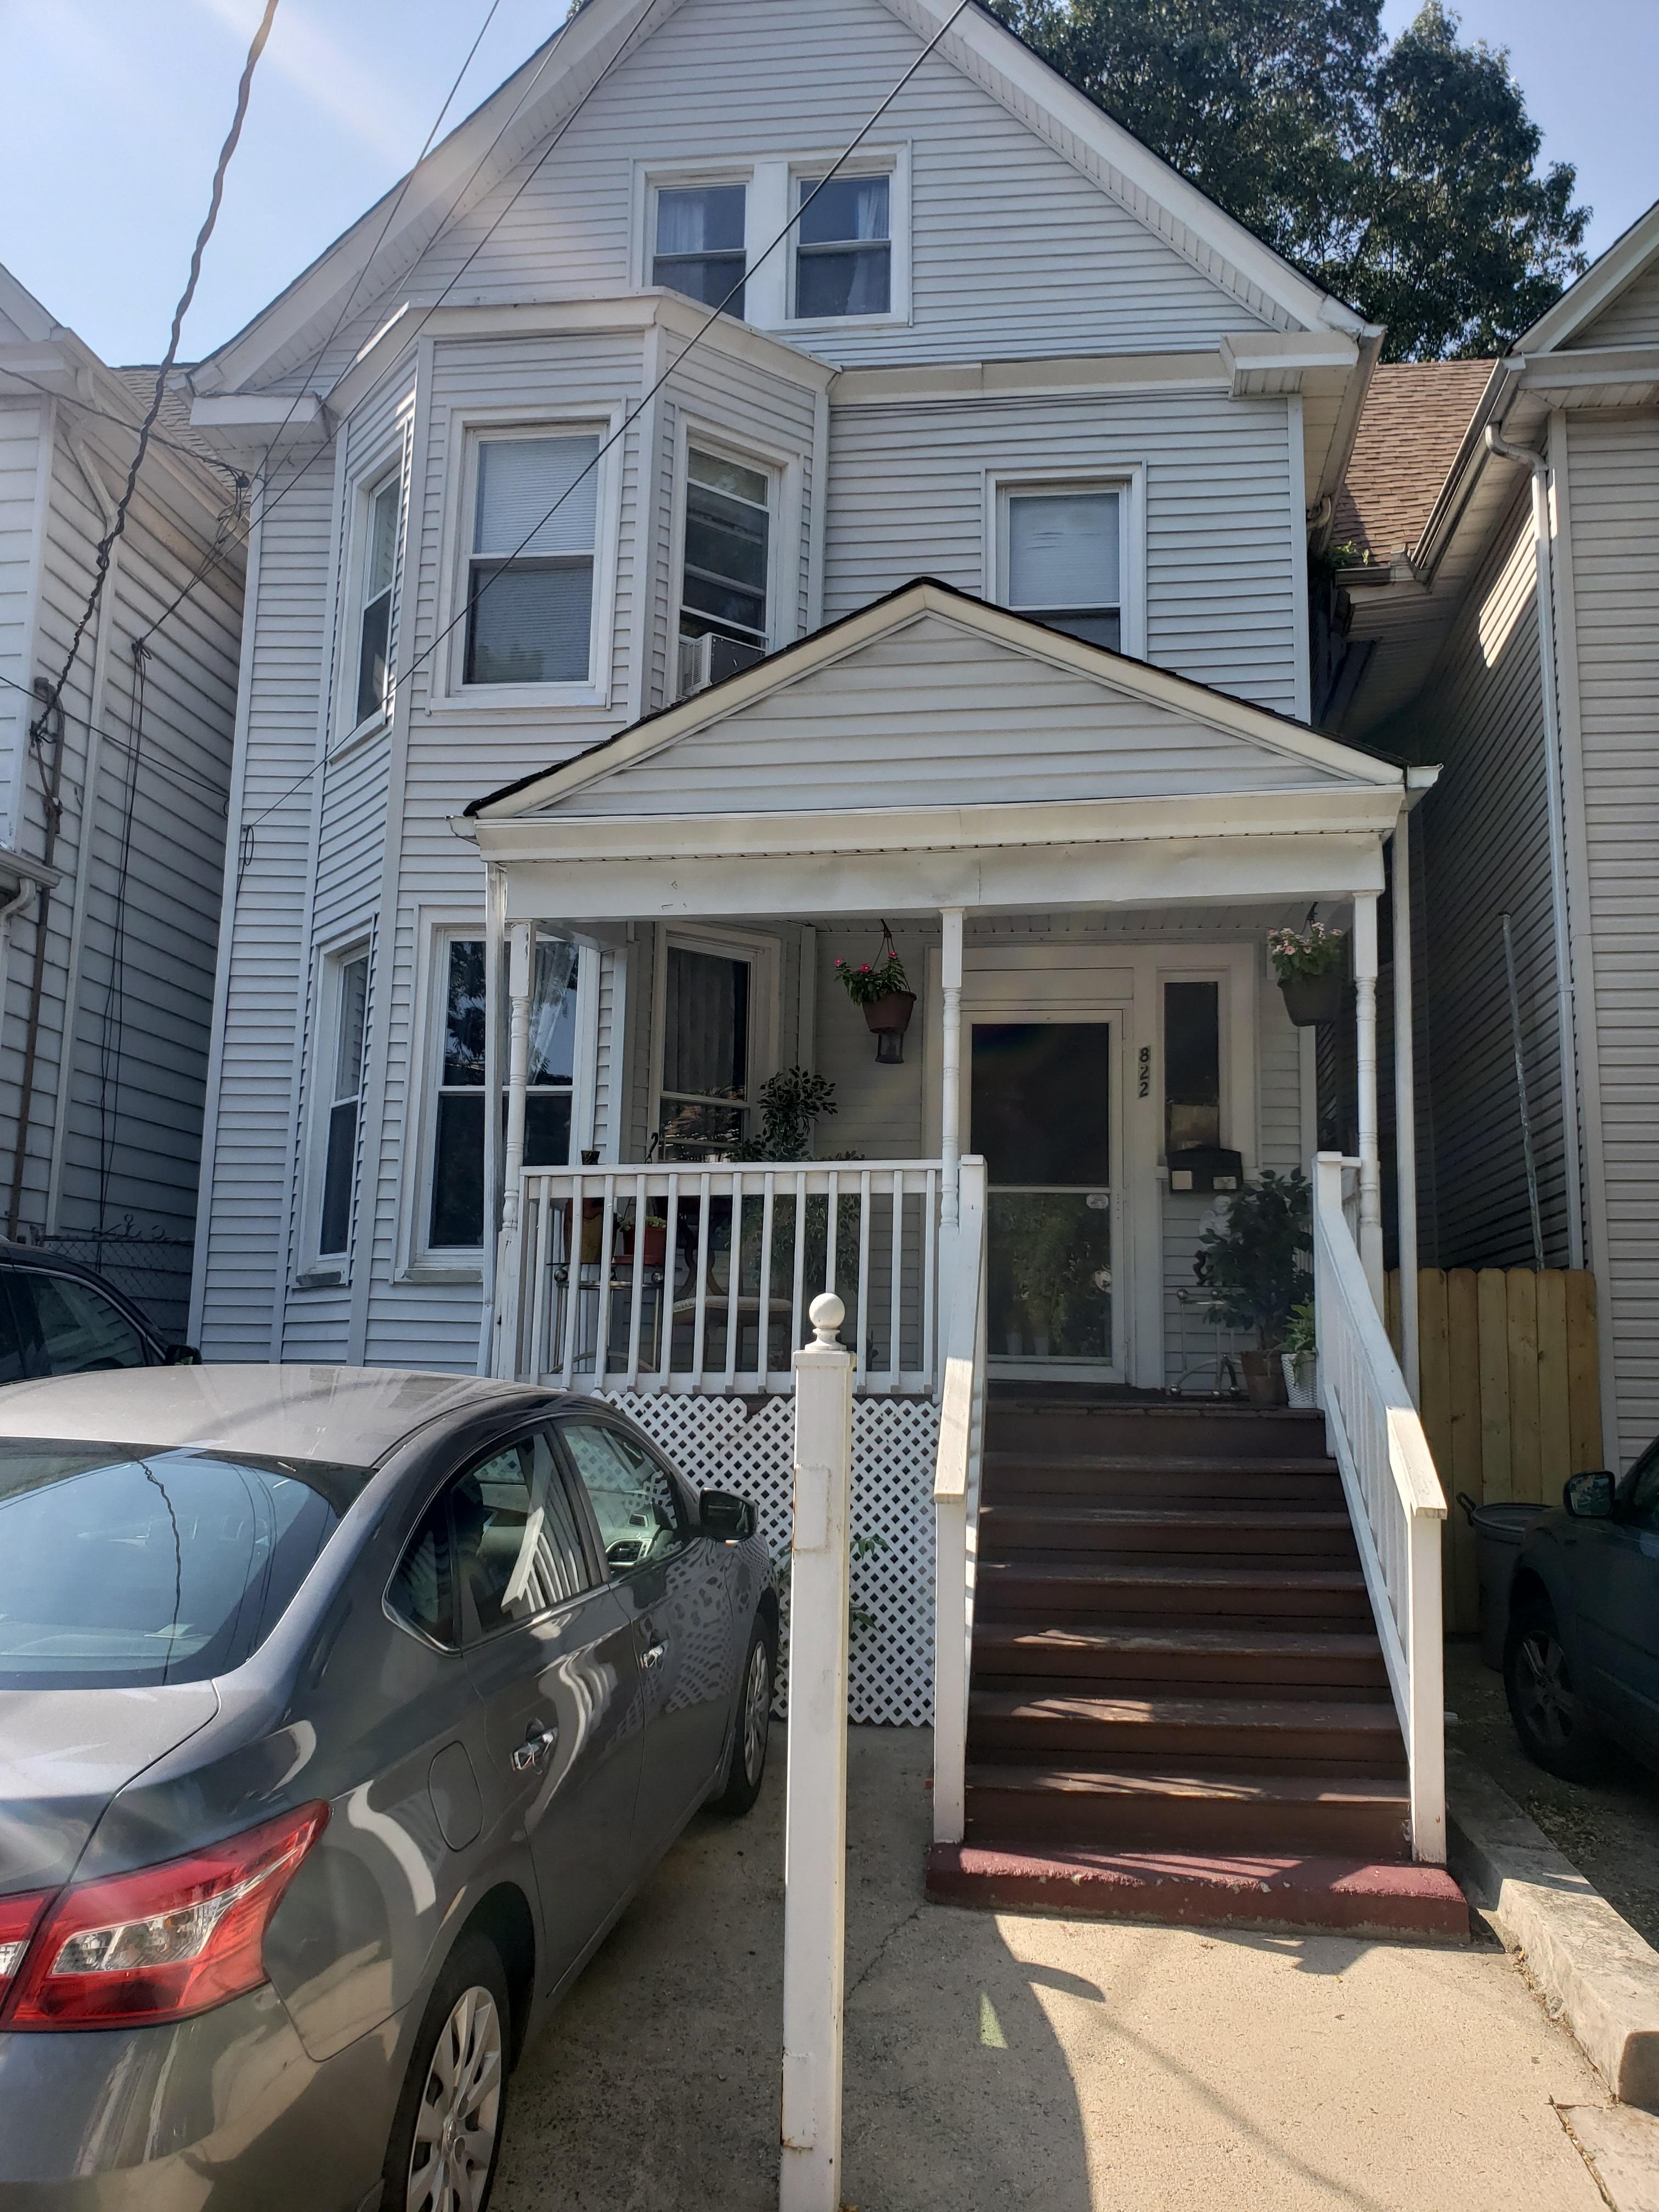 [NEW LISTING] 822 Ridge St. Newark, NJ 07104 $365,000